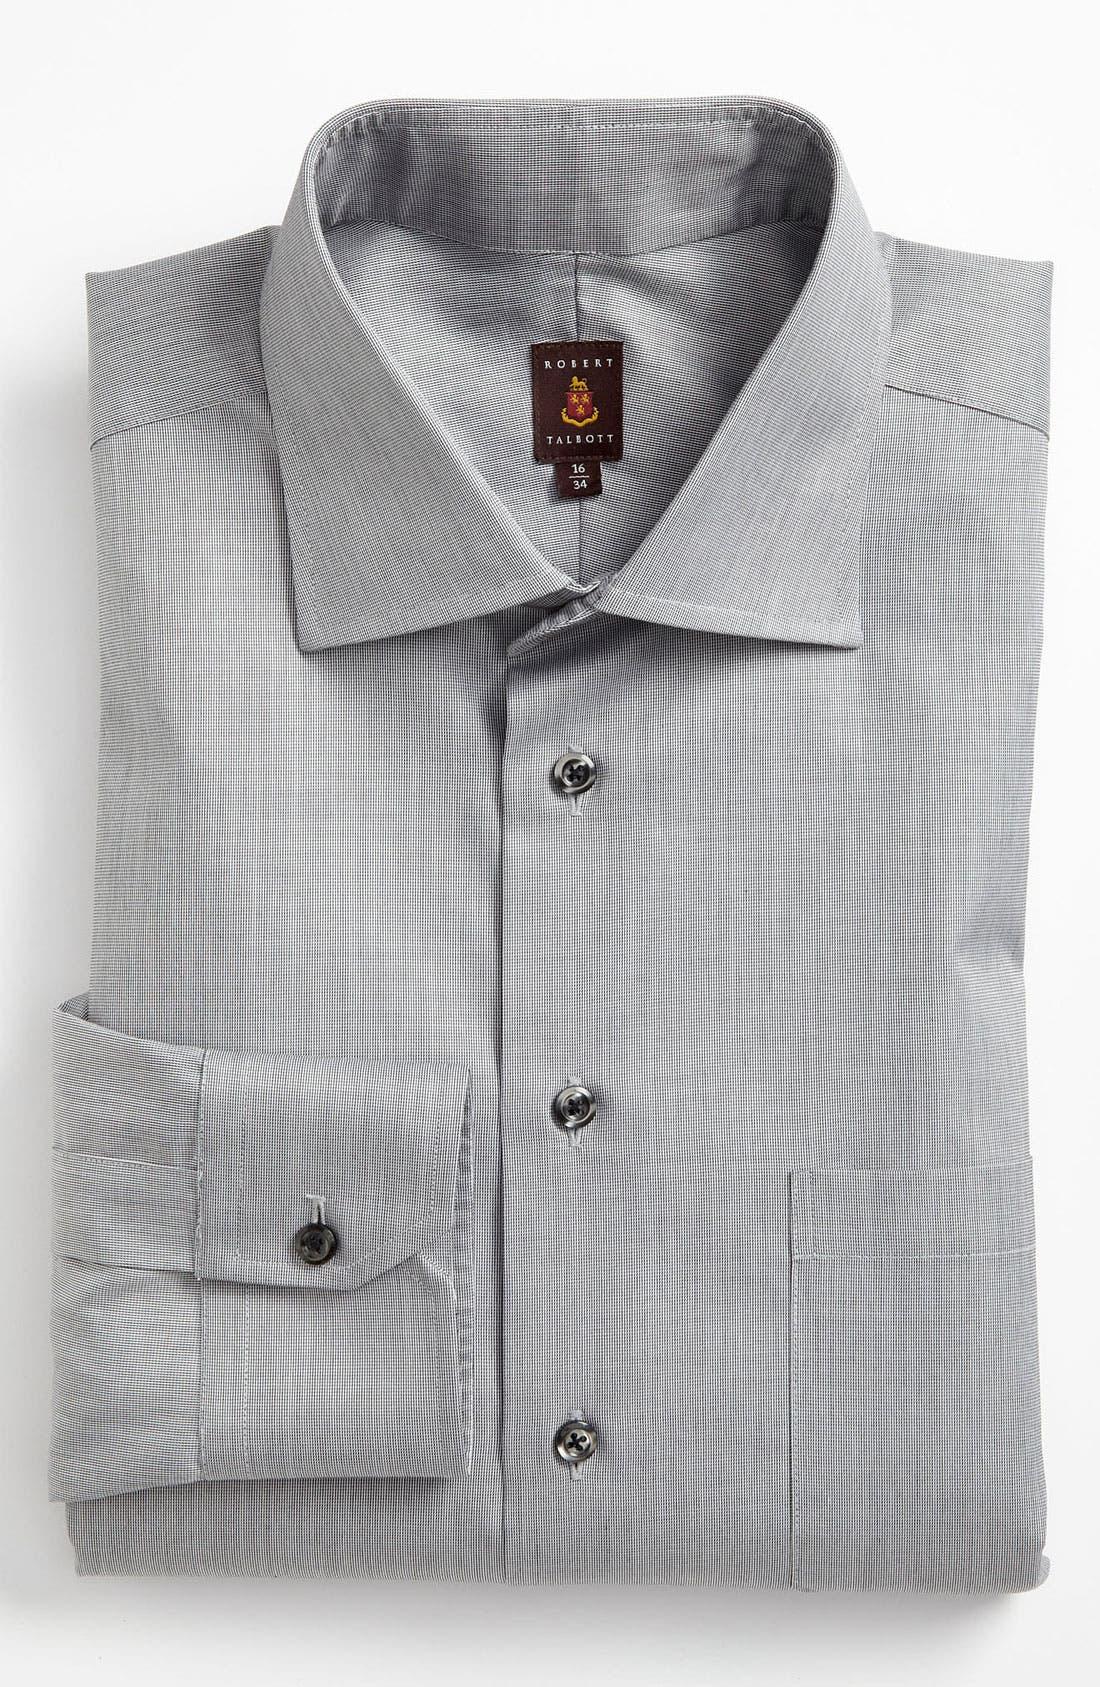 Alternate Image 1 Selected - Robert Talbott Regular Fit Dress Shirt (Online Only)